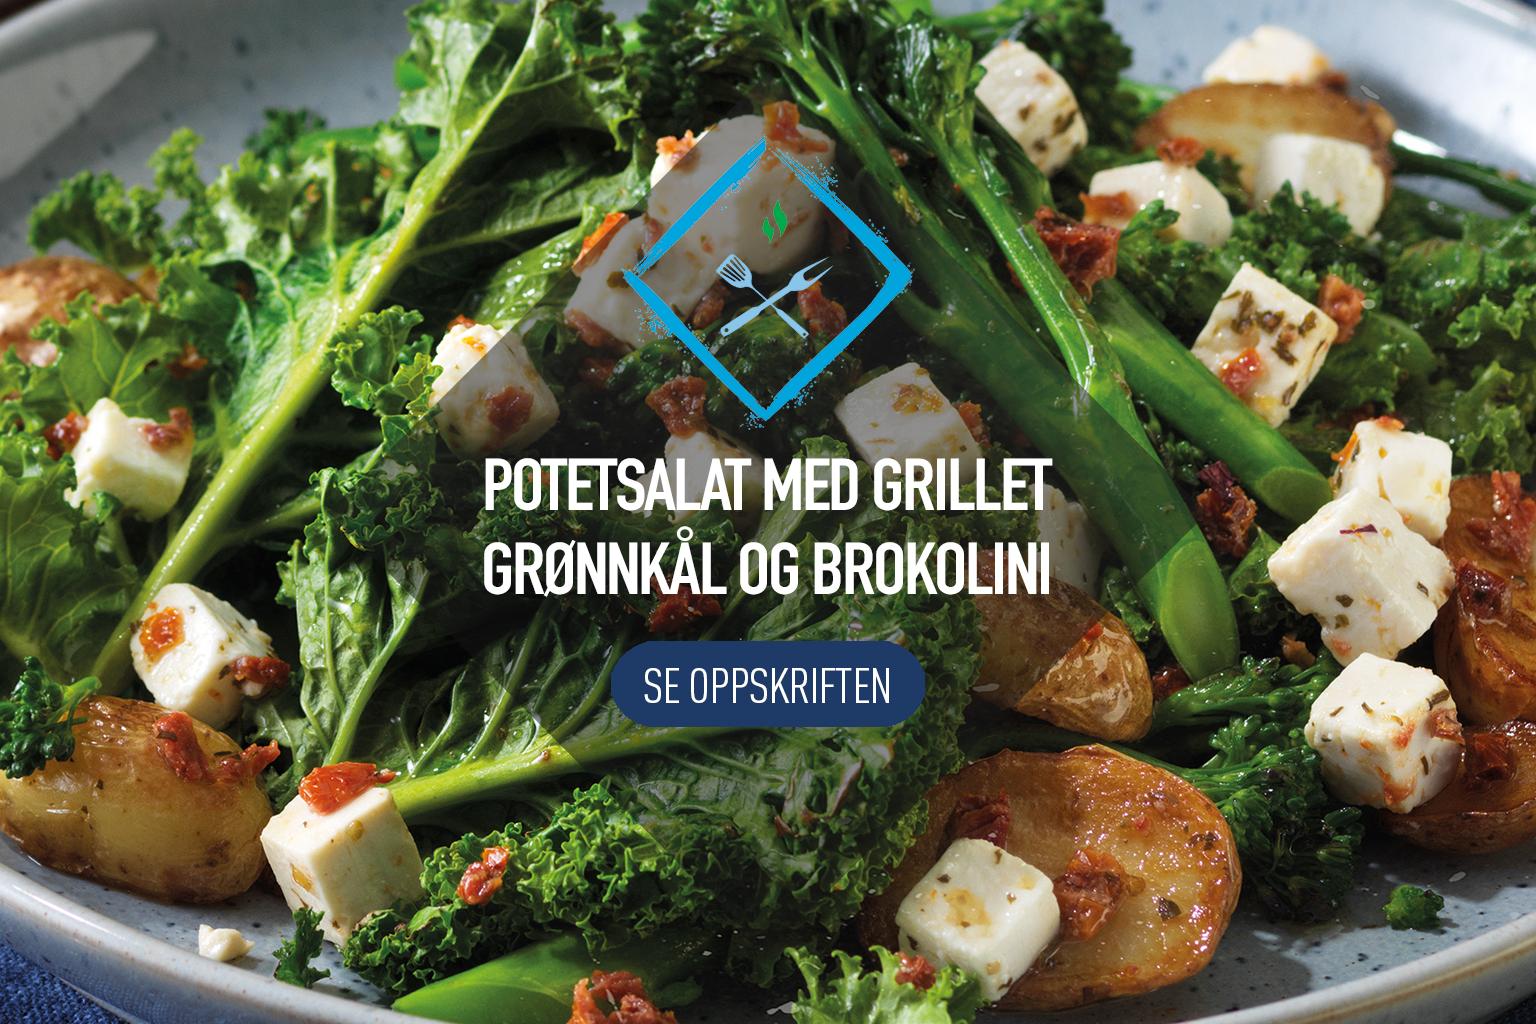 Potetsalat med stekt grønnkål og brokkolini